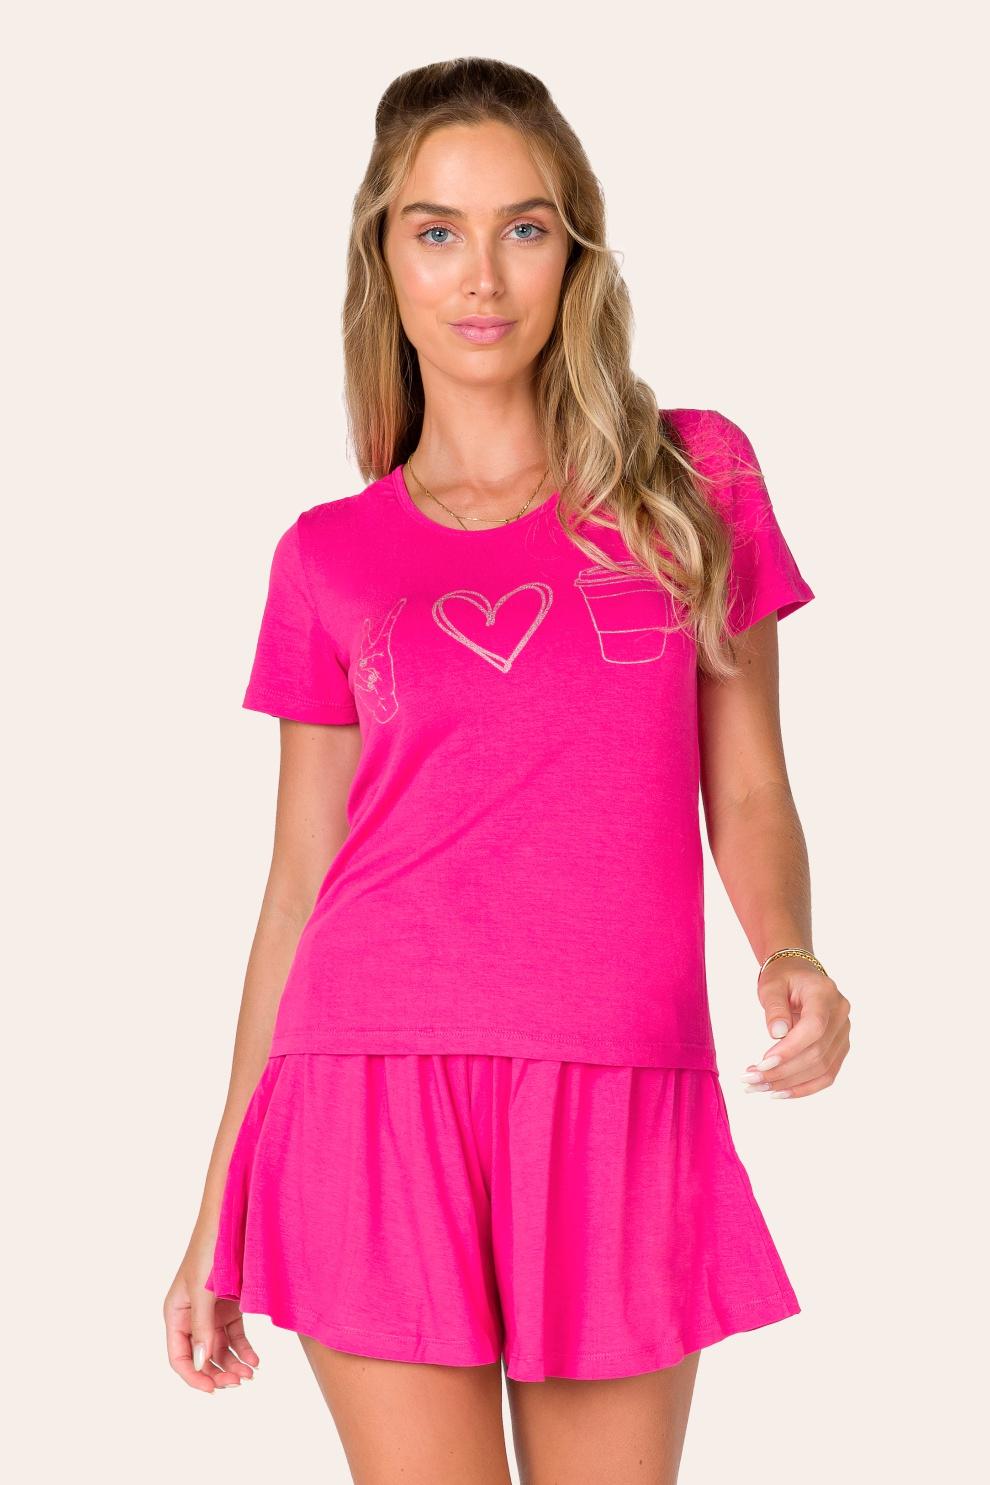 025/D - Pijama Curto Adulto Feminino Love